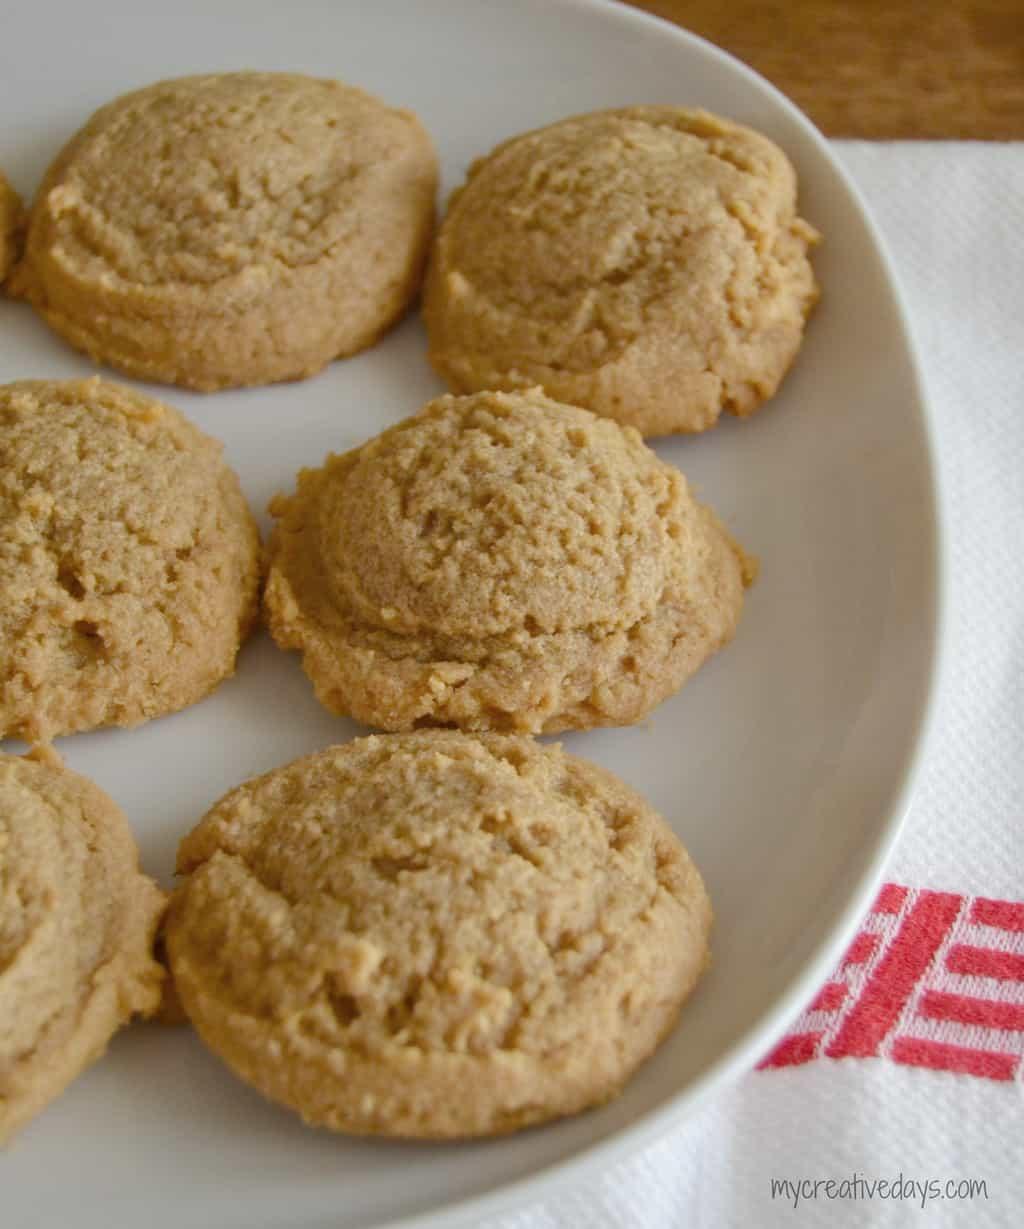 3 Ingredient Peanut Butter Cookies mycreativedays.com